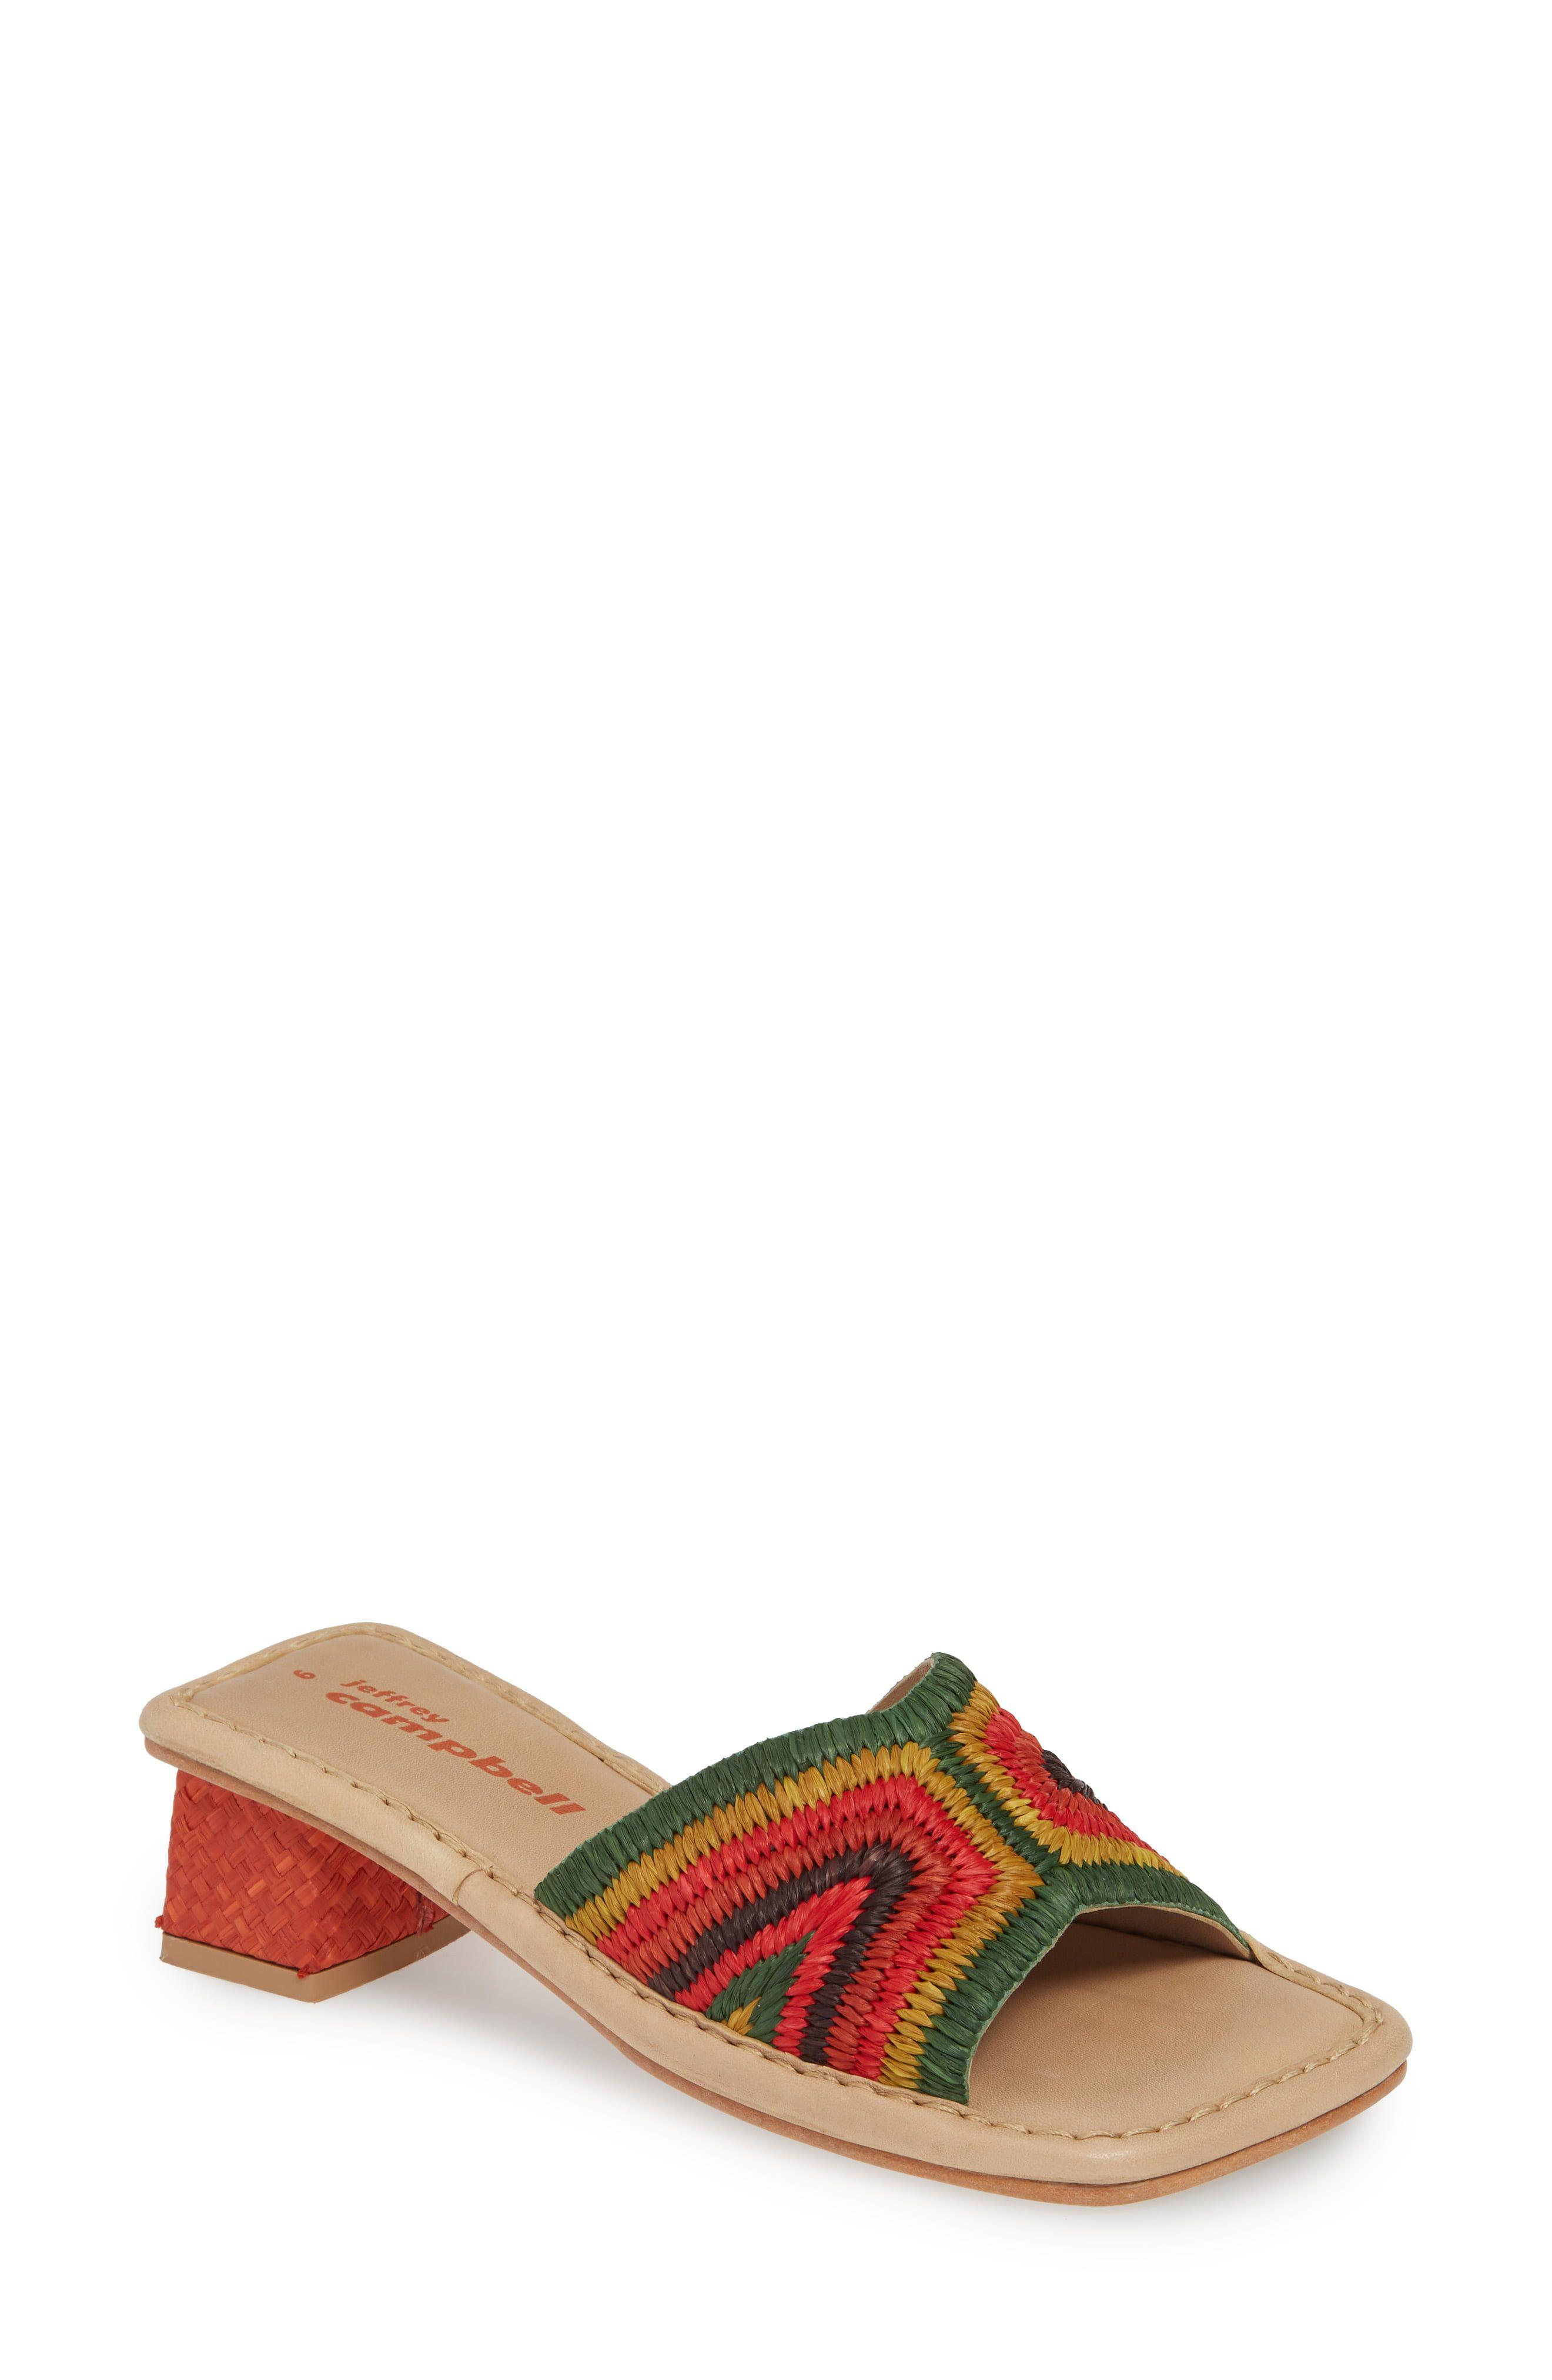 Women's Jeffrey Campbell Kaelan Slide Sandal, Size 8.5 M